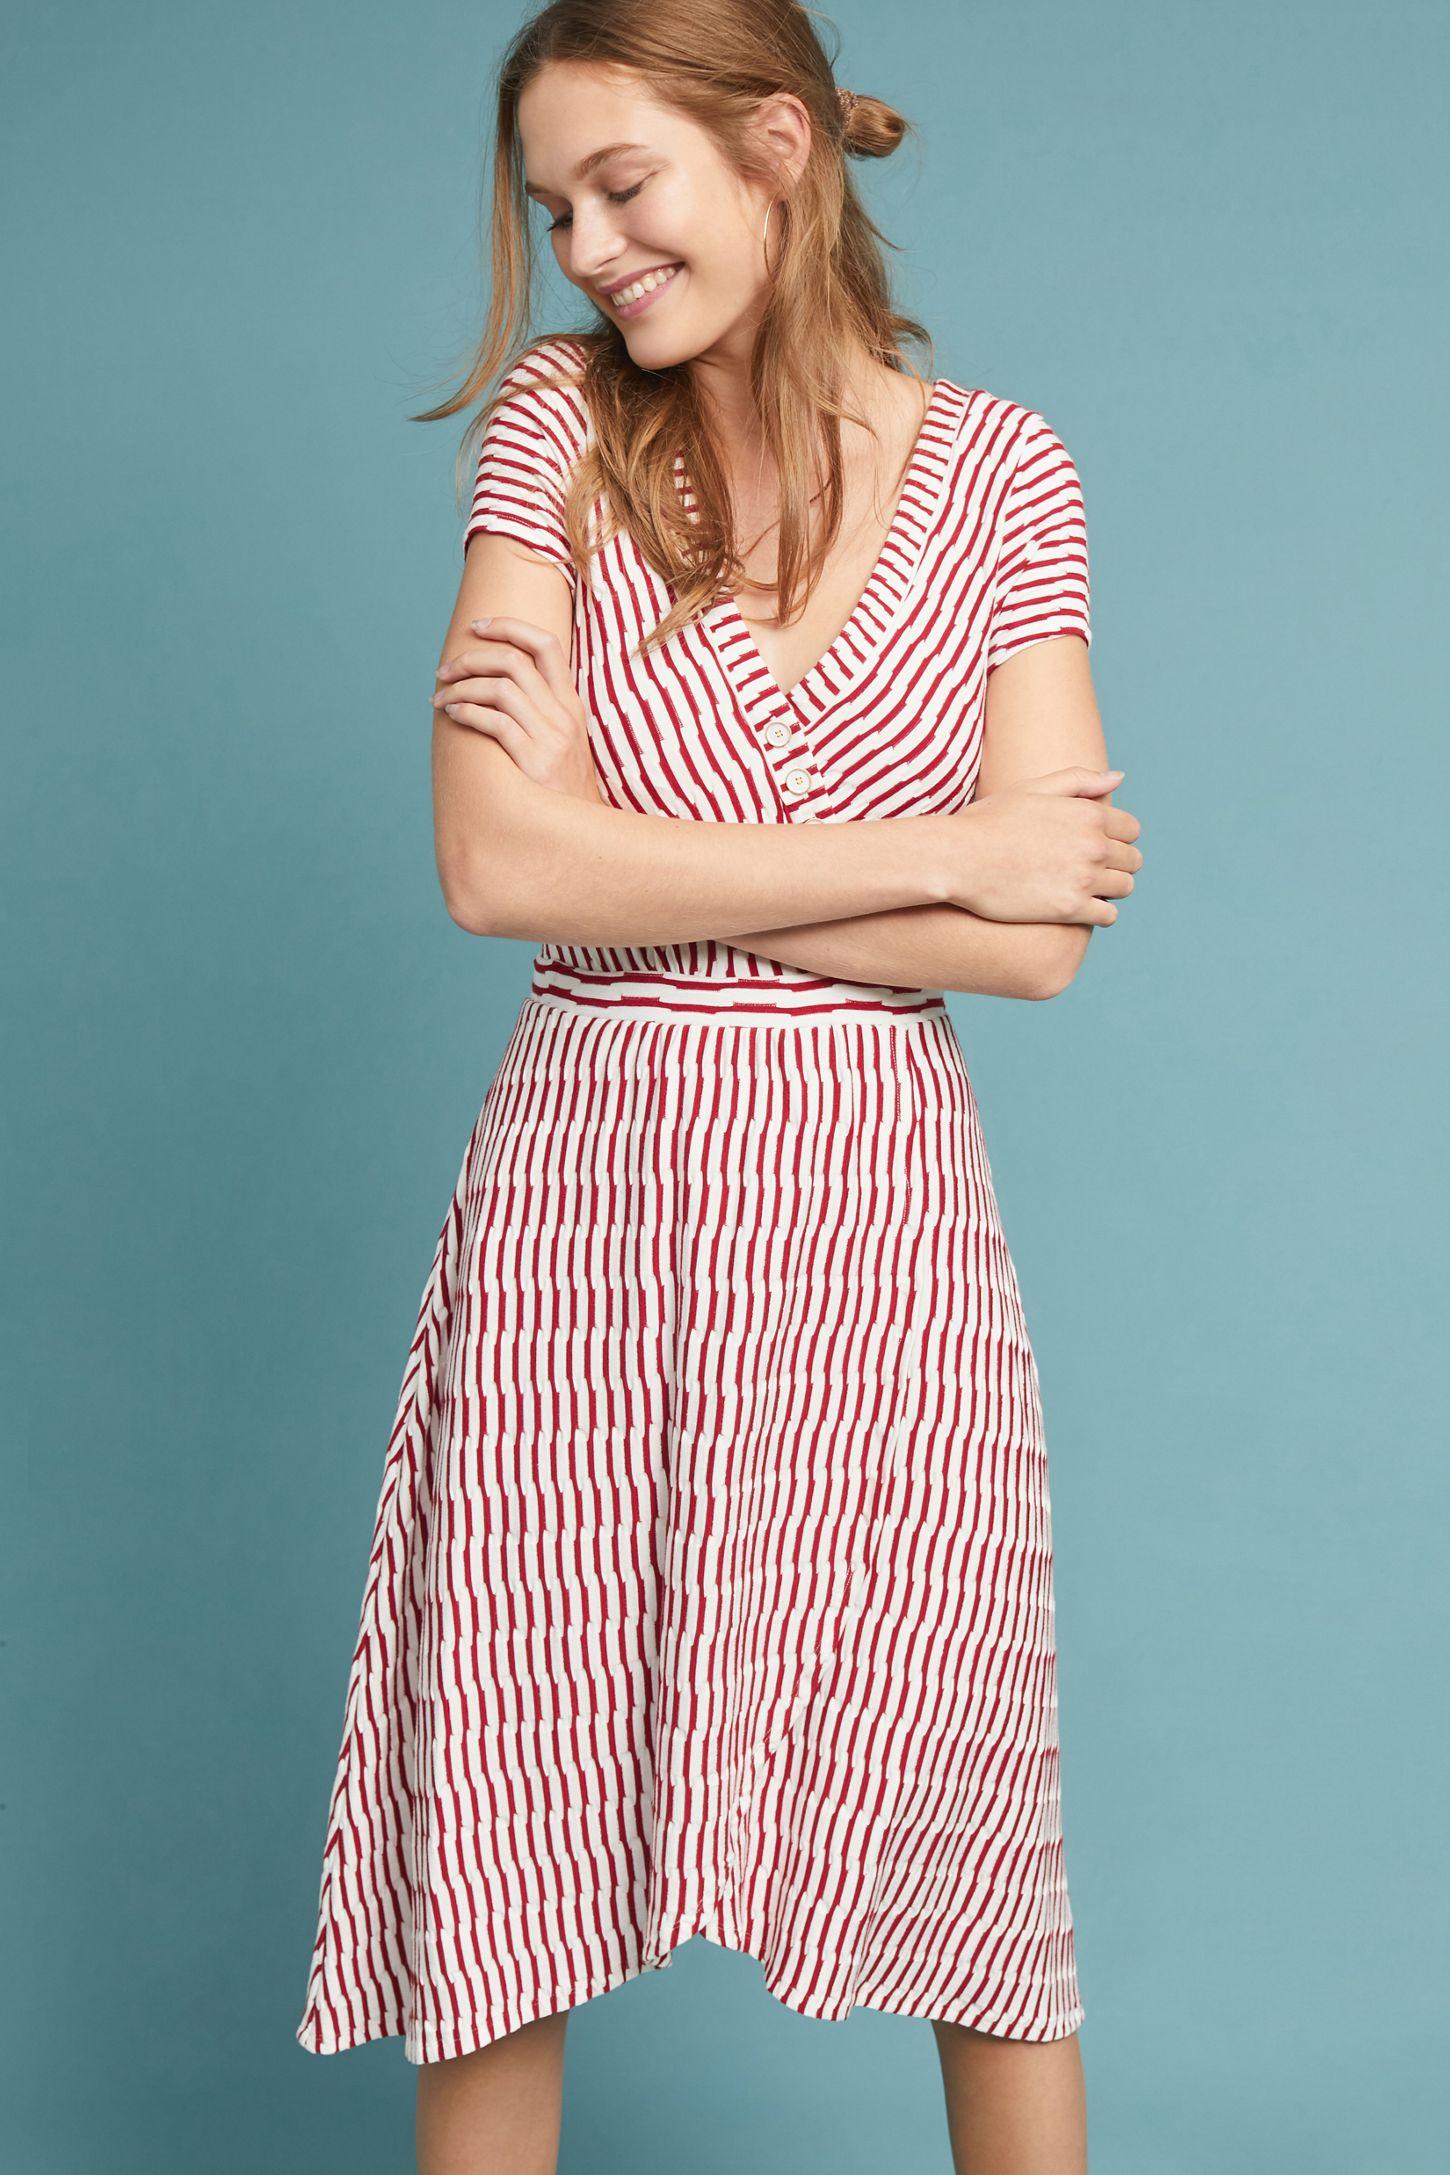 ab543cf43564 Paladino Textured Dress